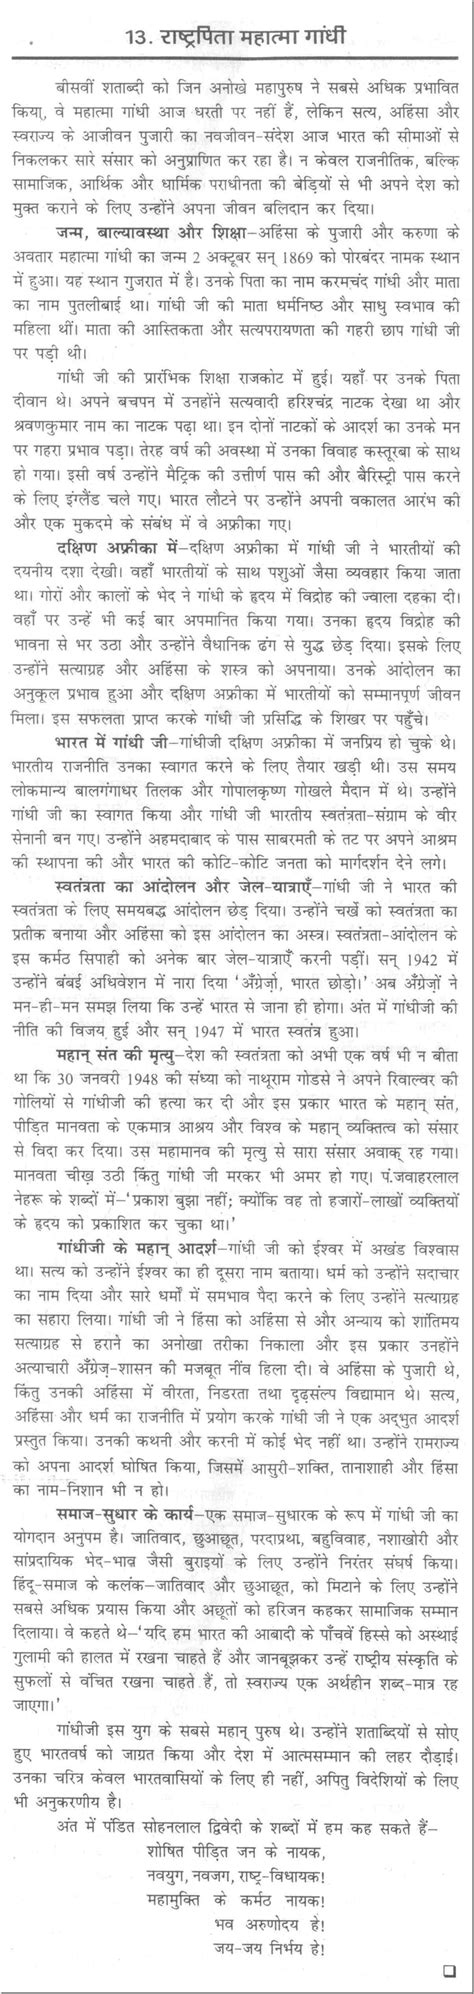 mahatma gandhi biography gujarati language mahatma gandhi essay in gujarati language resources